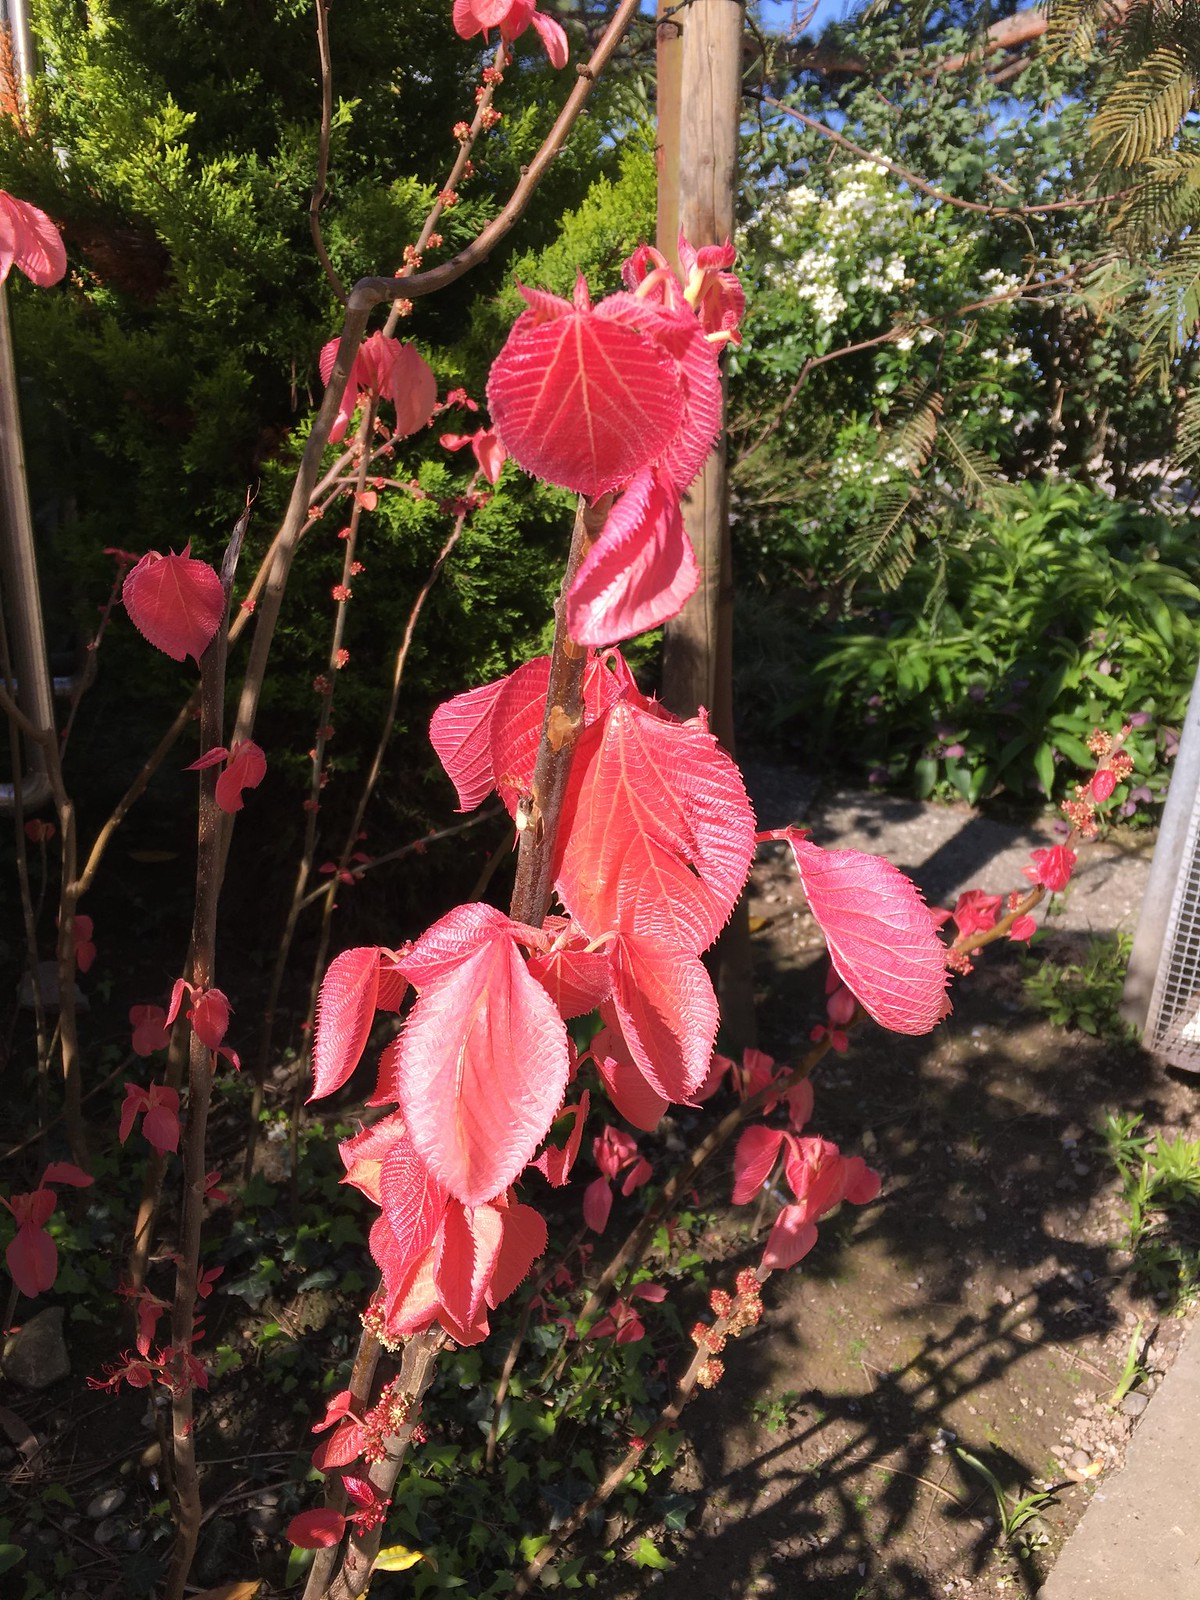 Plante inconnue à feuilles roses 26727435555_e1a661e423_h